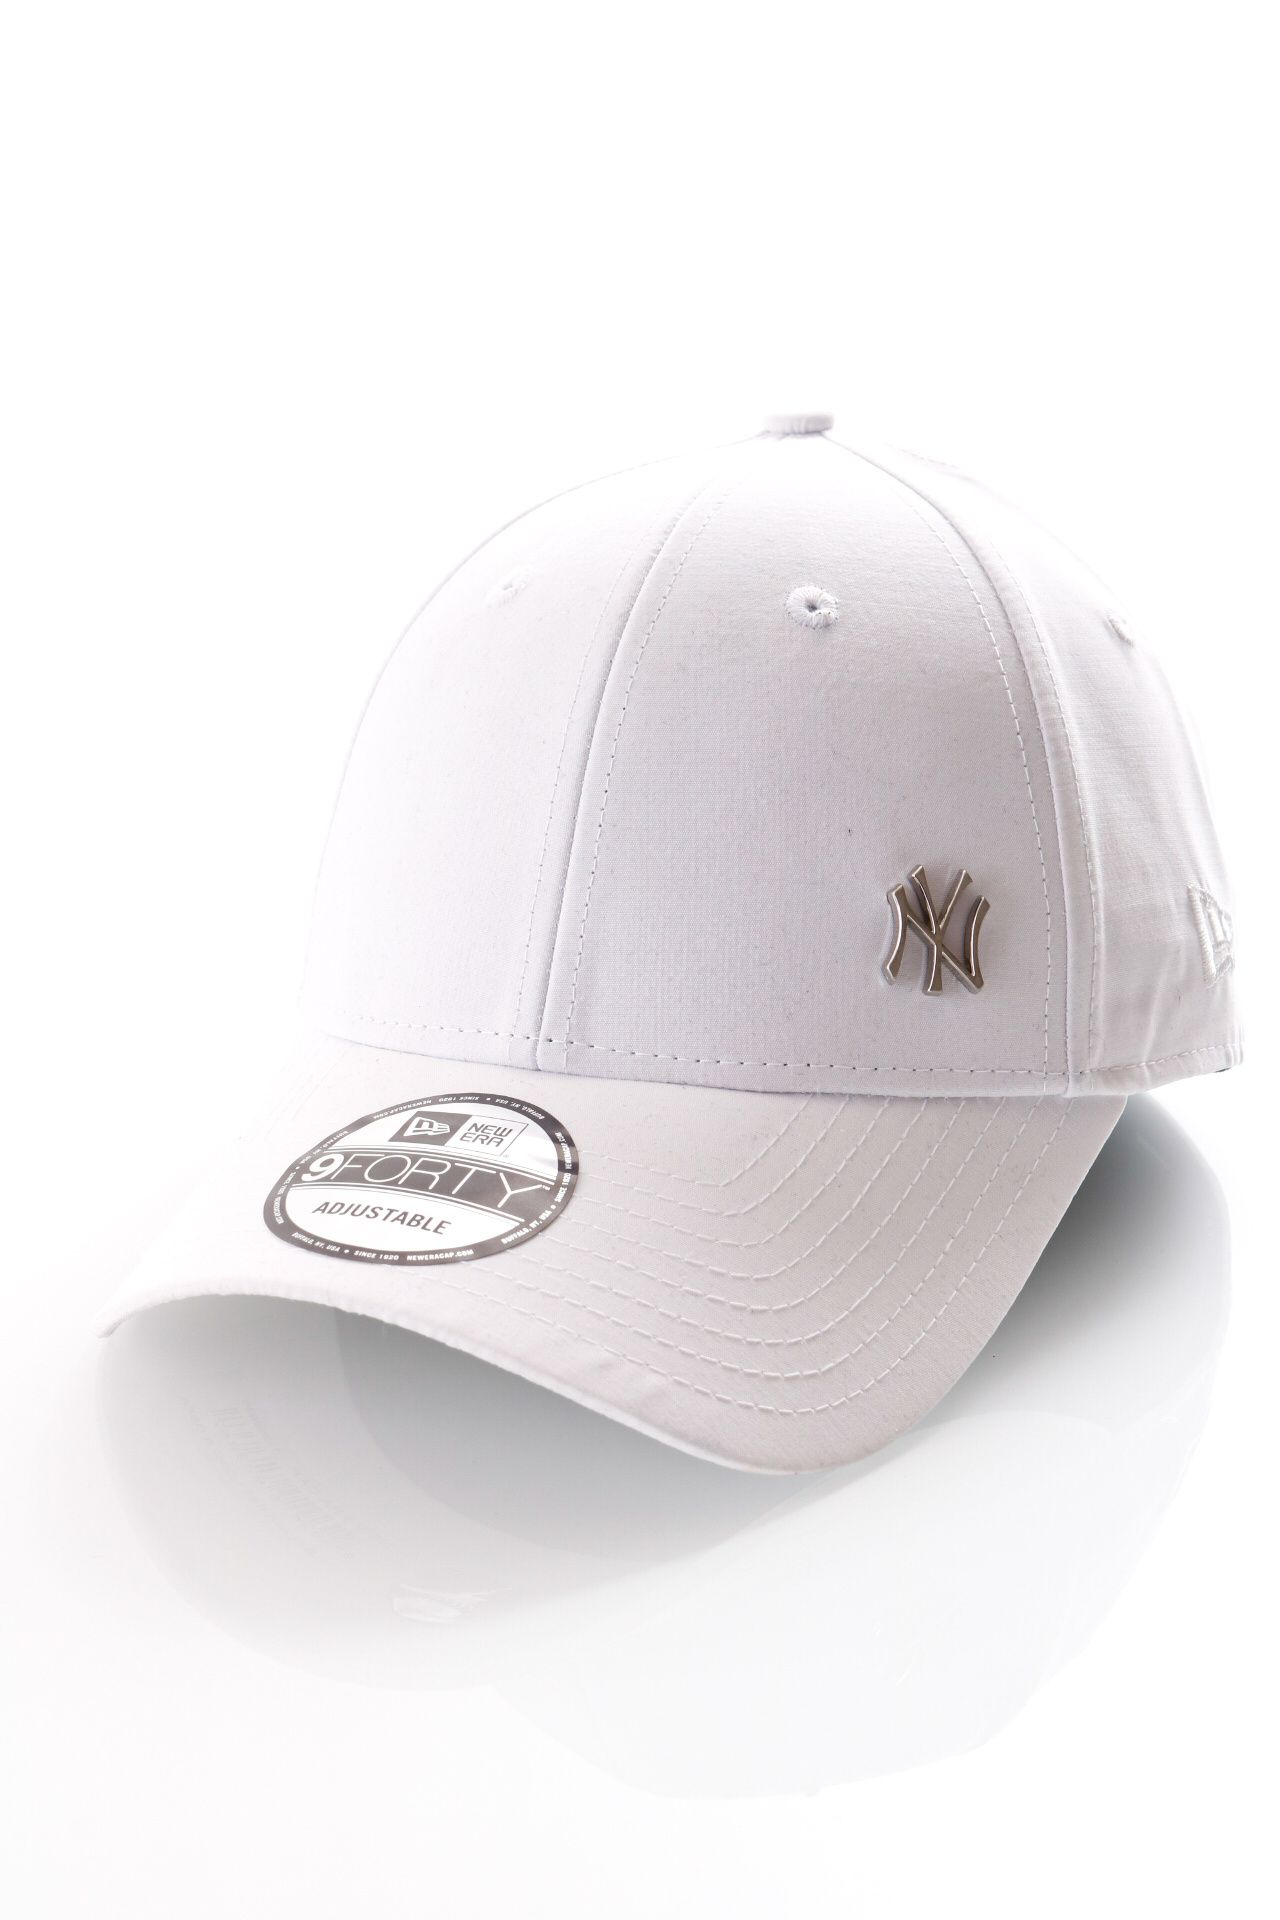 Afbeelding van New Era Dad Cap MLB Flawless Logo Basic 940 Neyyan white 11209938